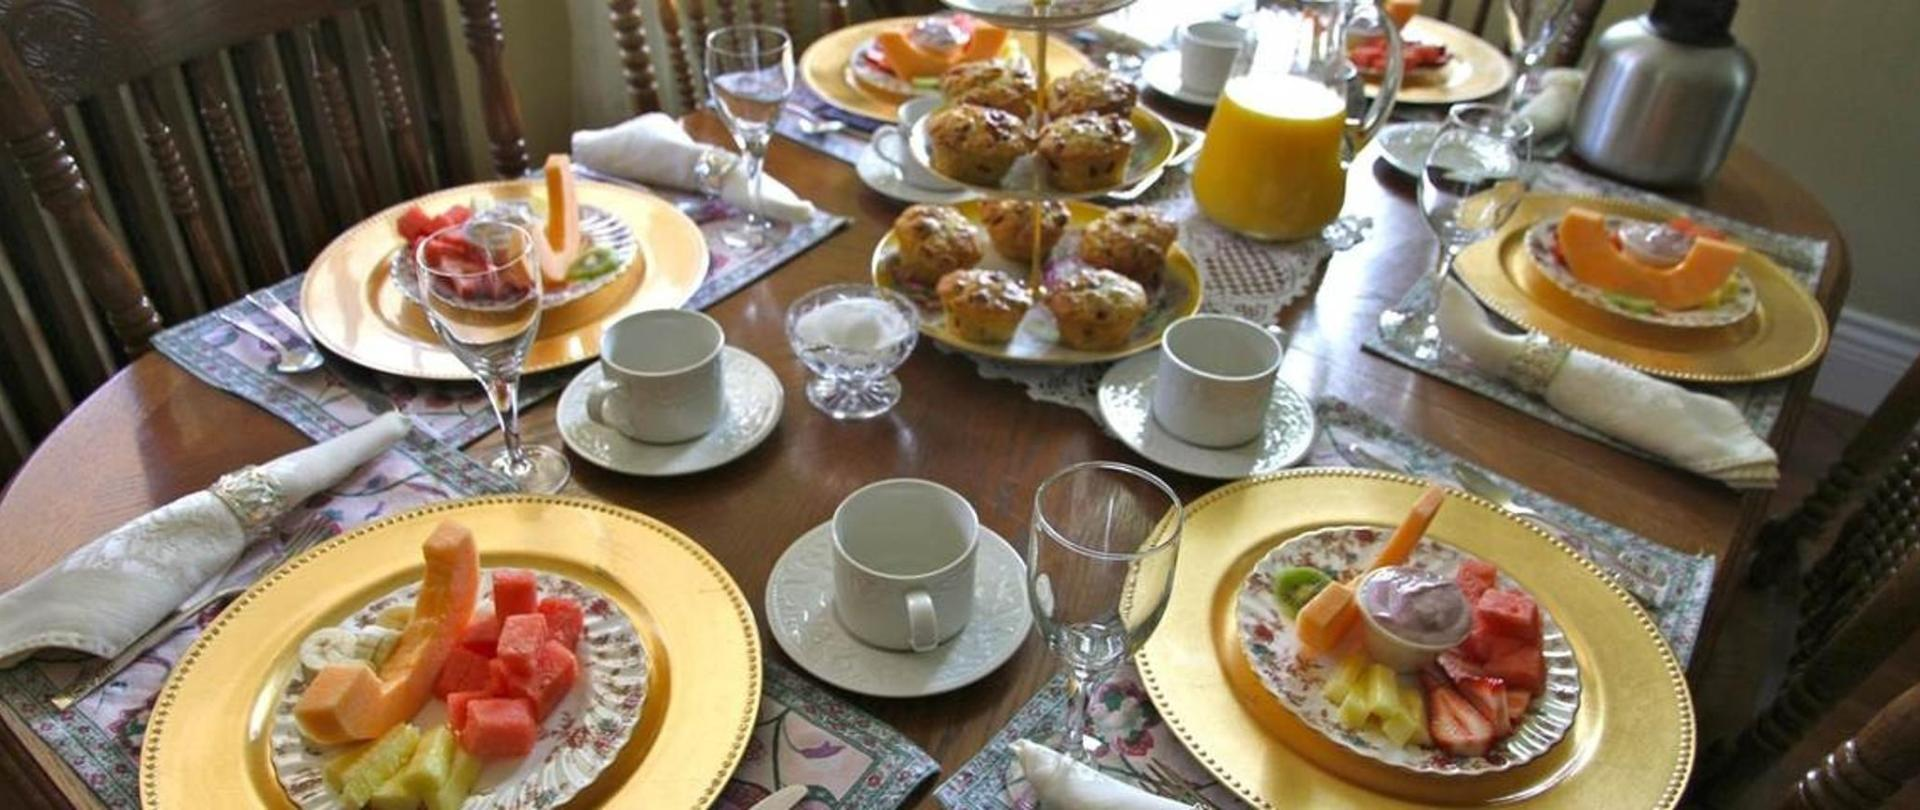 Clayburn Village Bed and Breakfast